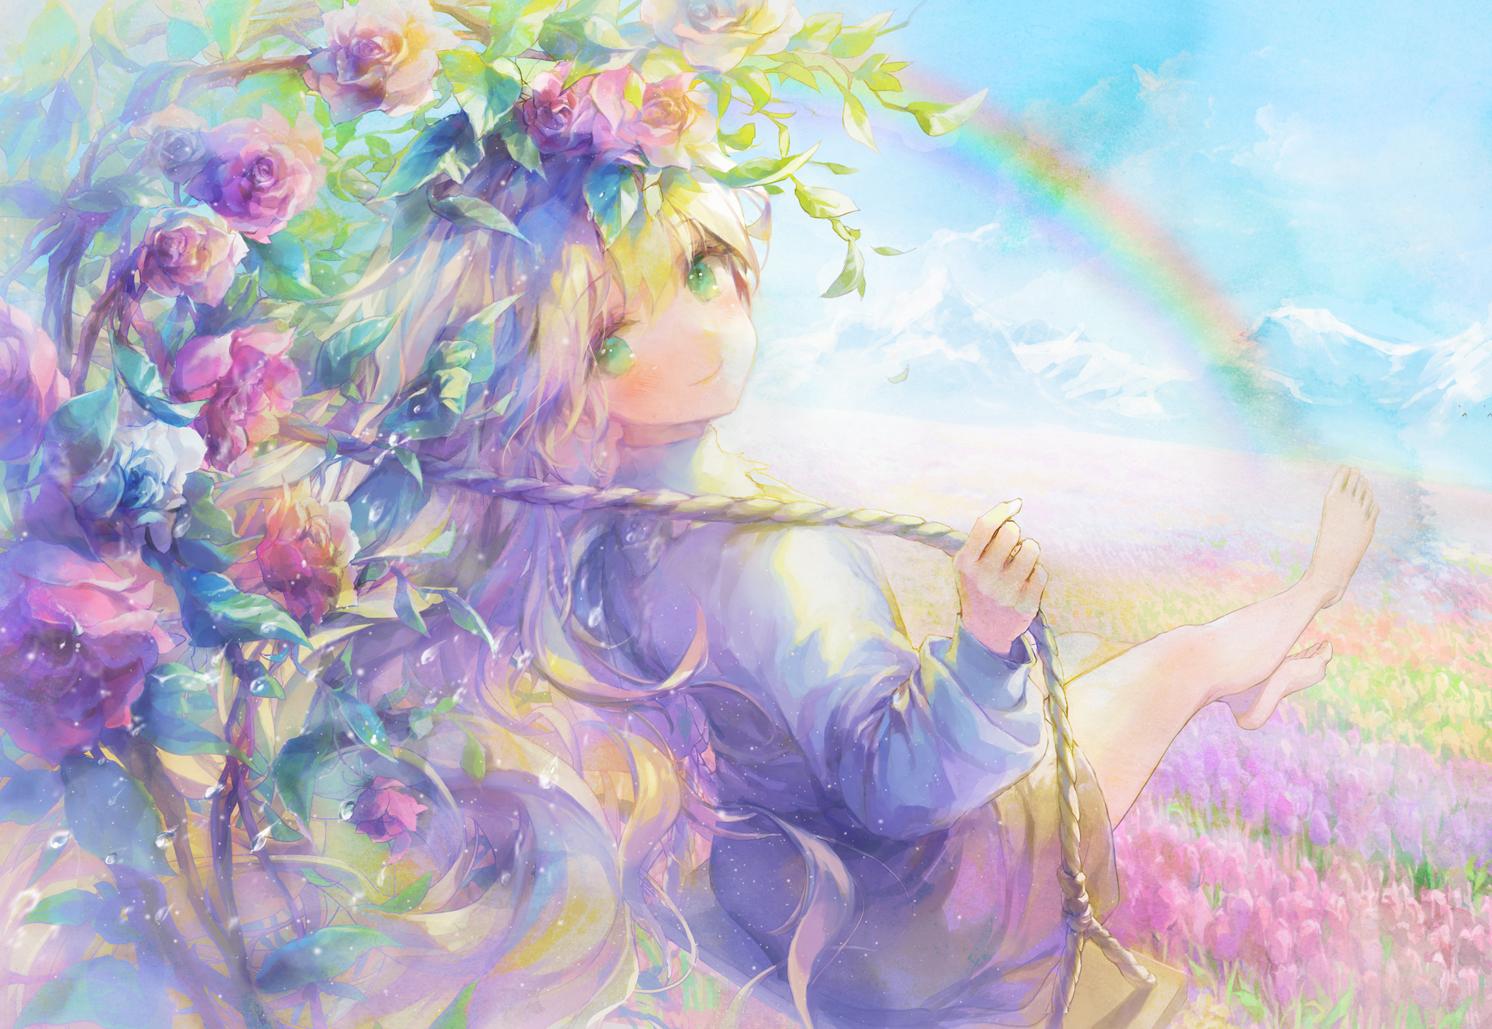 888myrrh888 barefoot blonde_hair blush clouds dress flowers green_eyes original rainbow sky